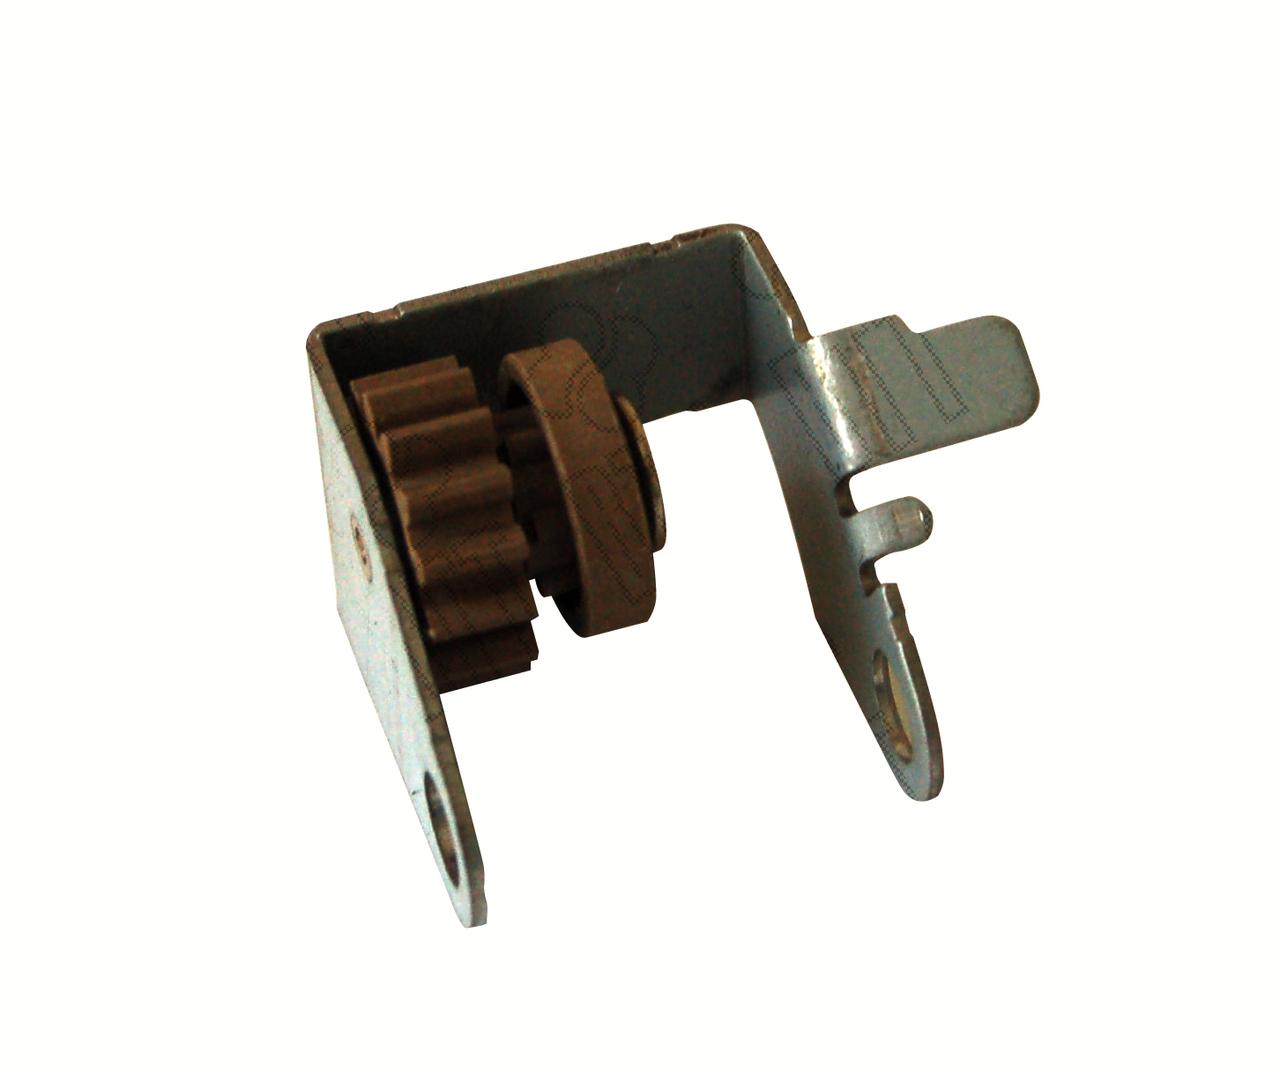 RF5-2409 Шестерня 14T в сборе в металлической скобеGP-160 (совместима с LJ 5000/5100) (NC